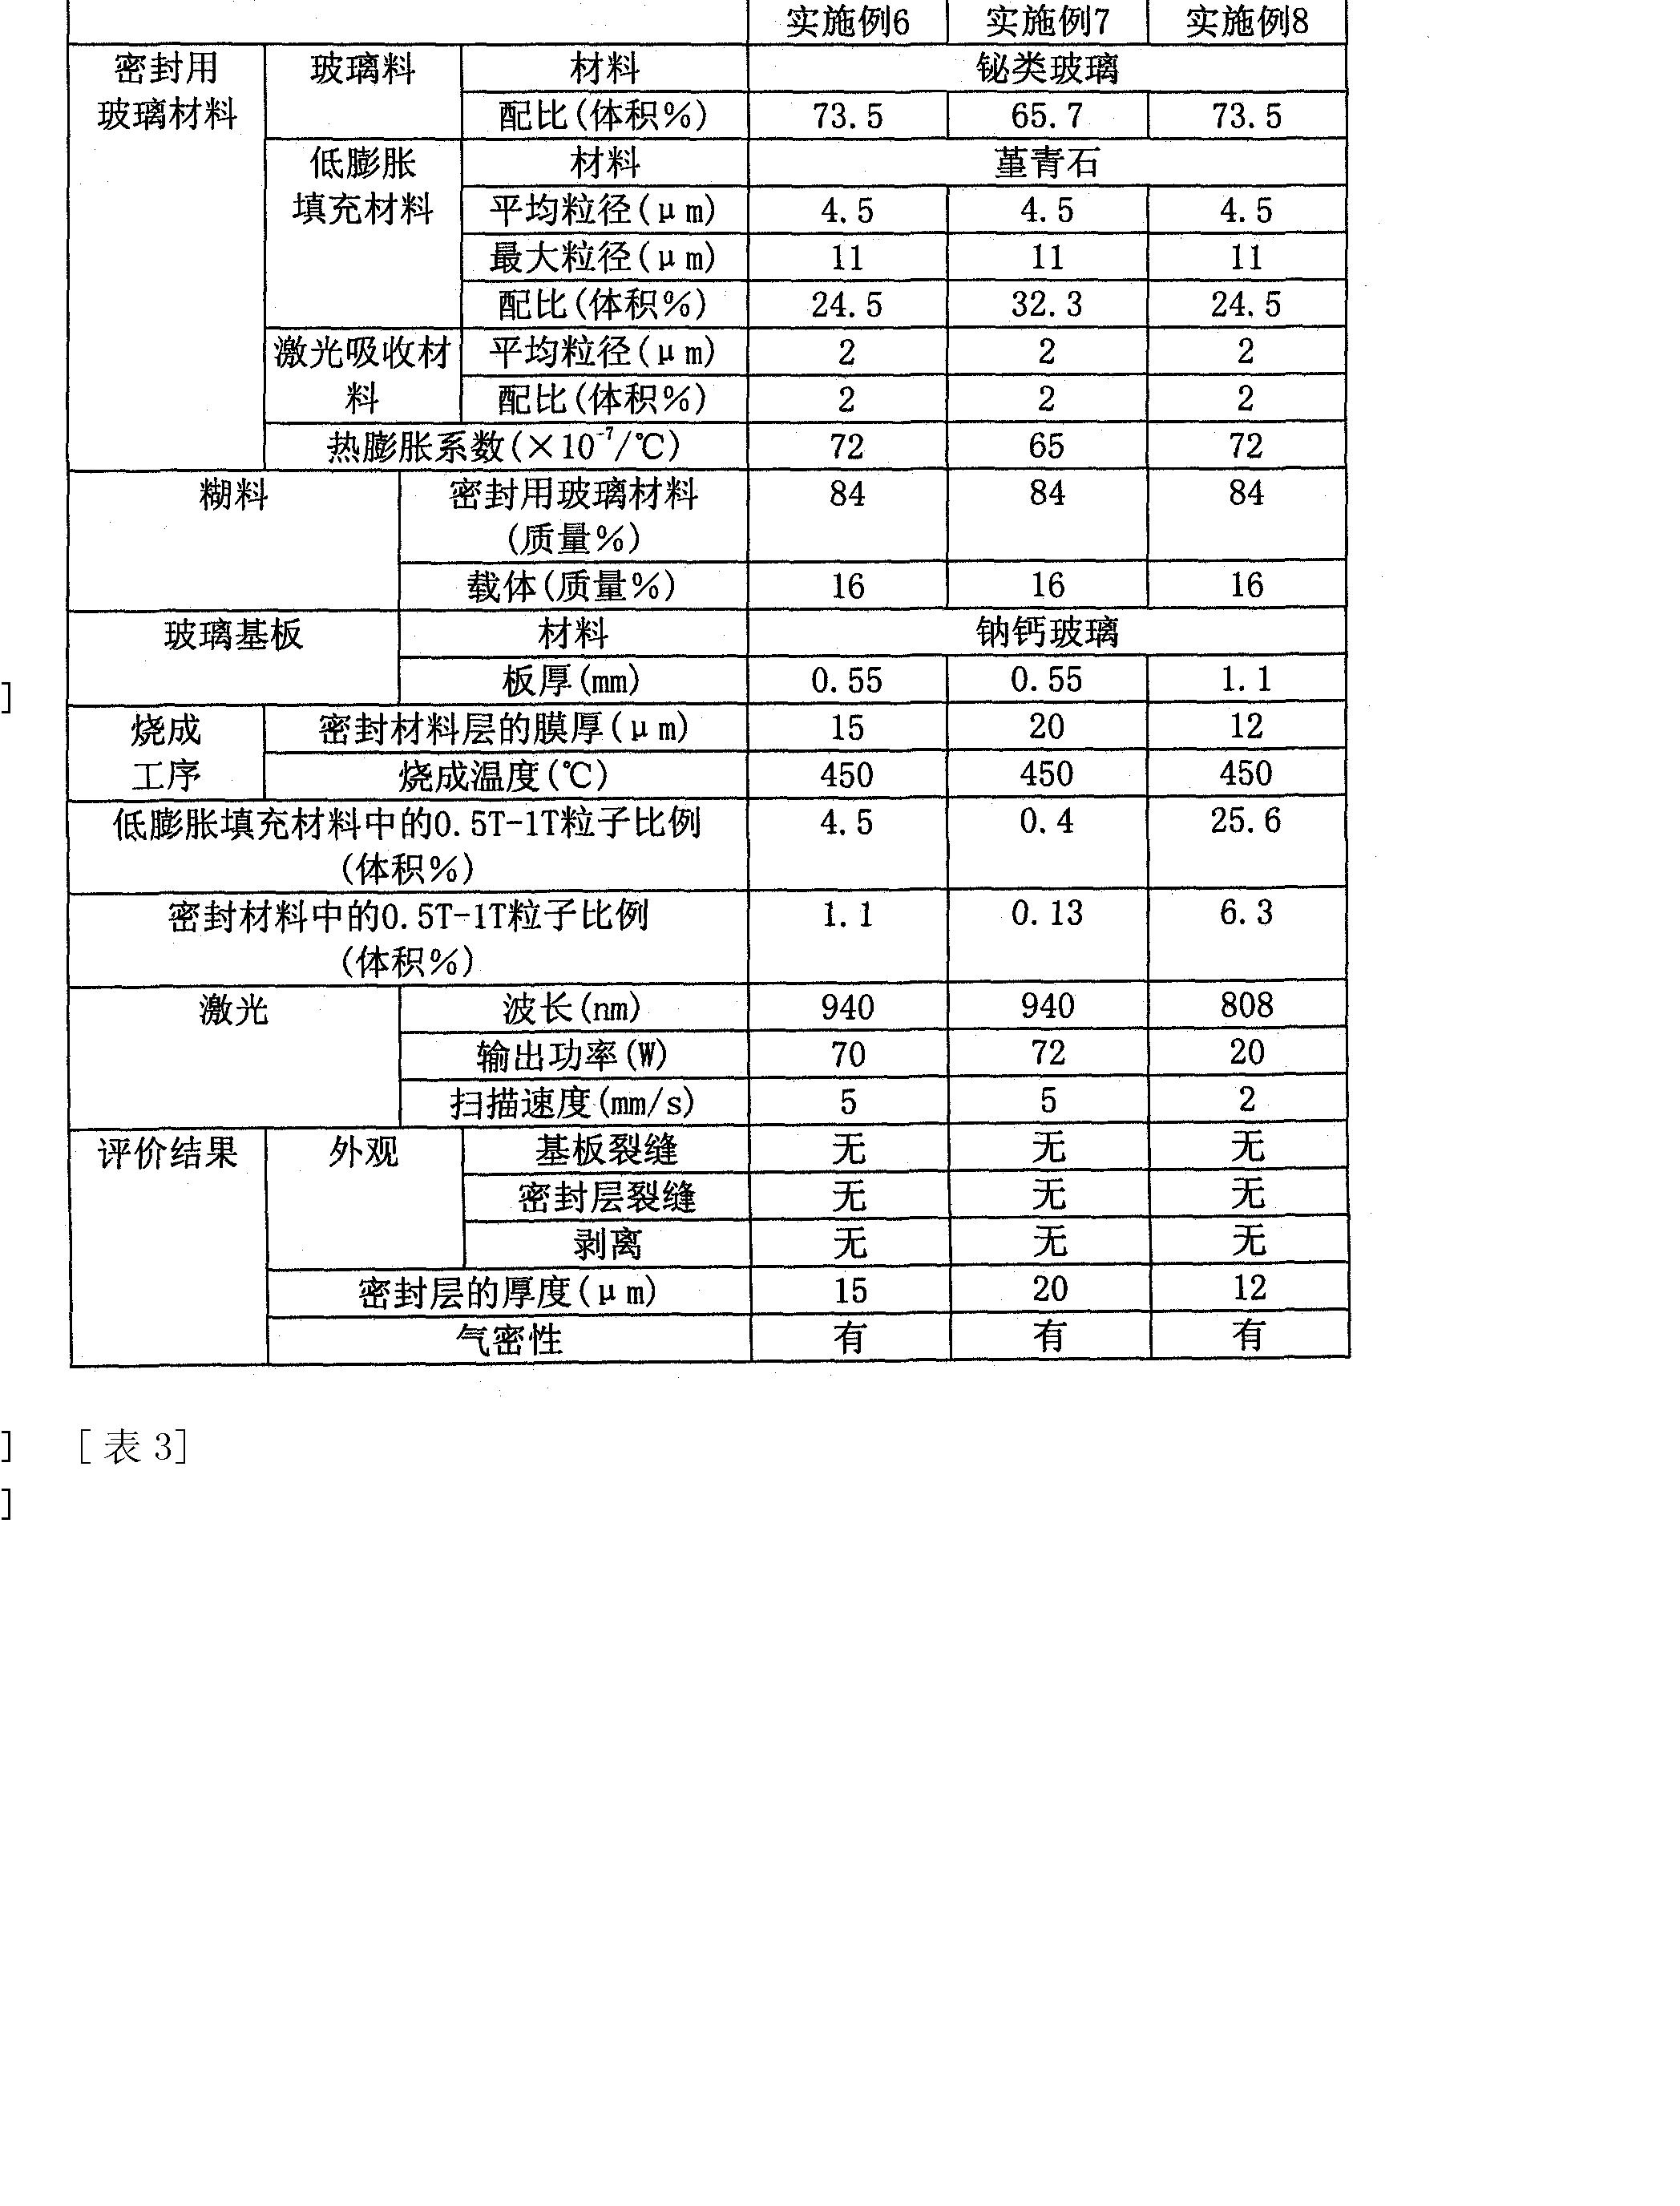 Figure CN102224115AD00201